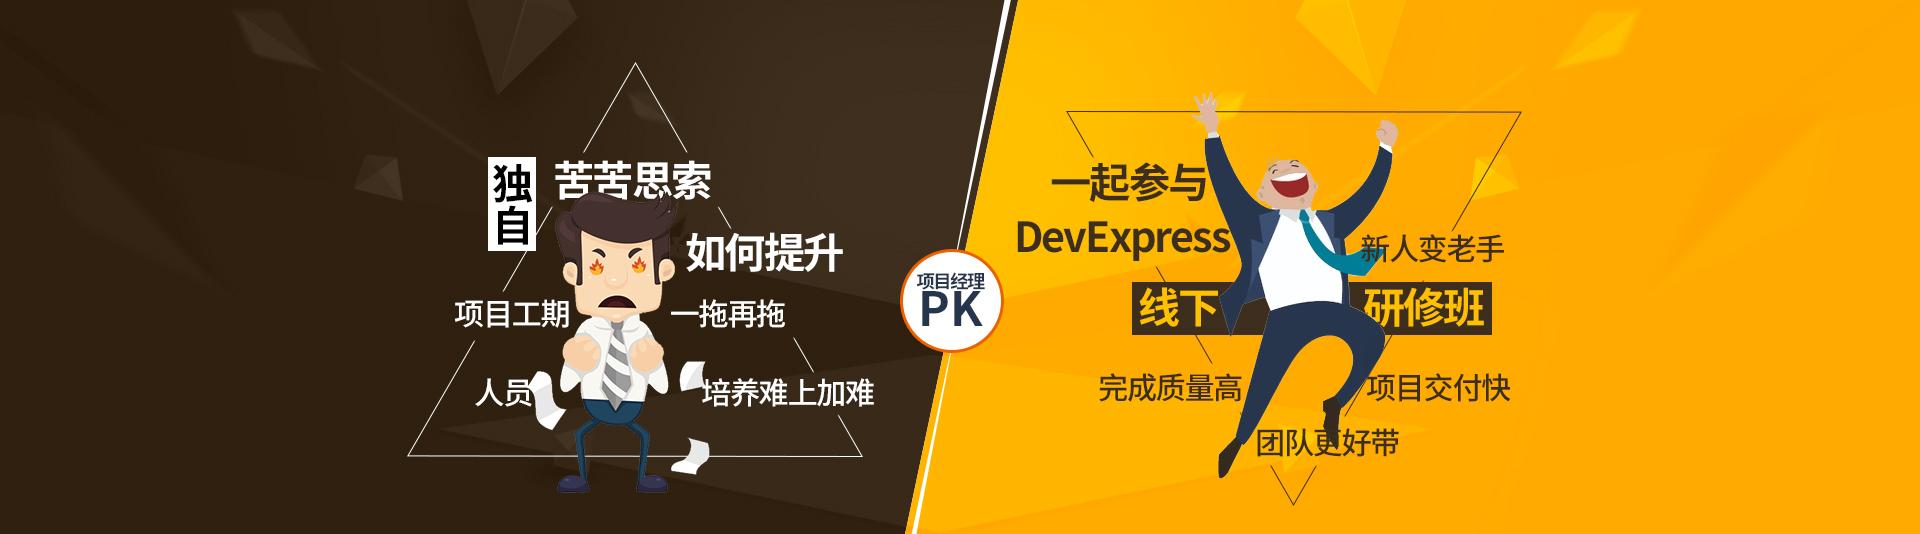 DevExpress 企业定制培训